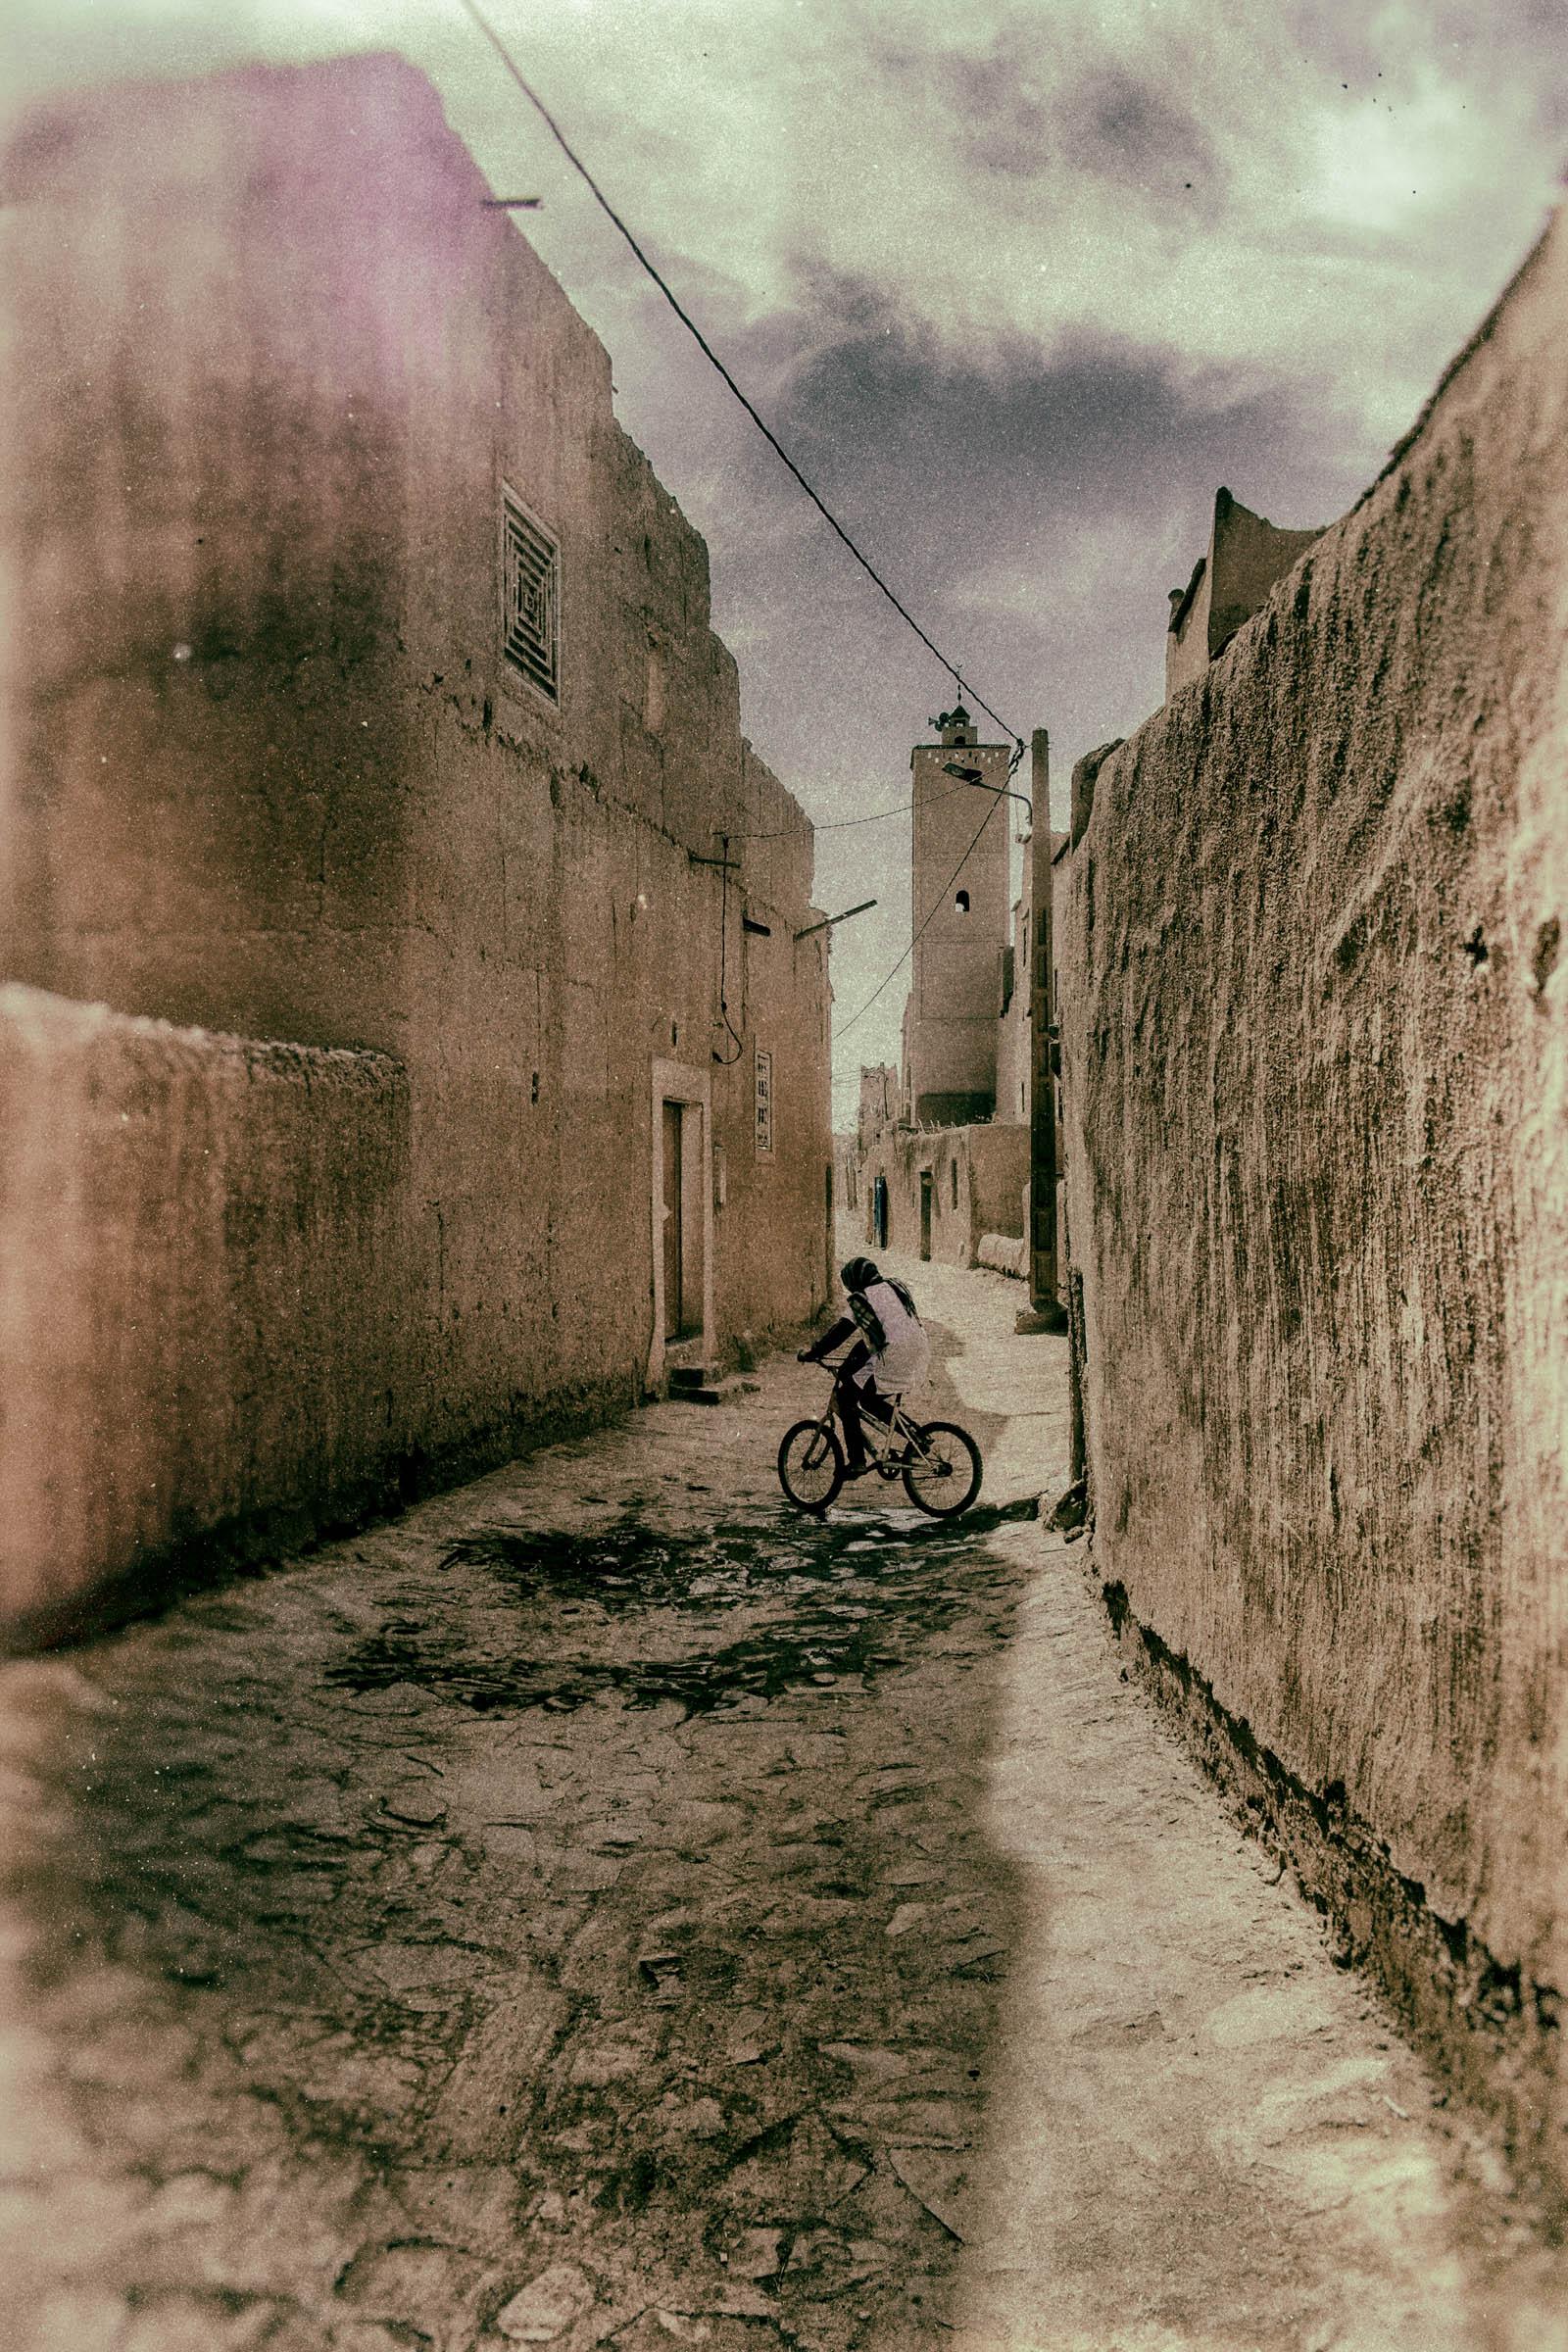 colours, maroc 2014, maroc sel websitejj, people